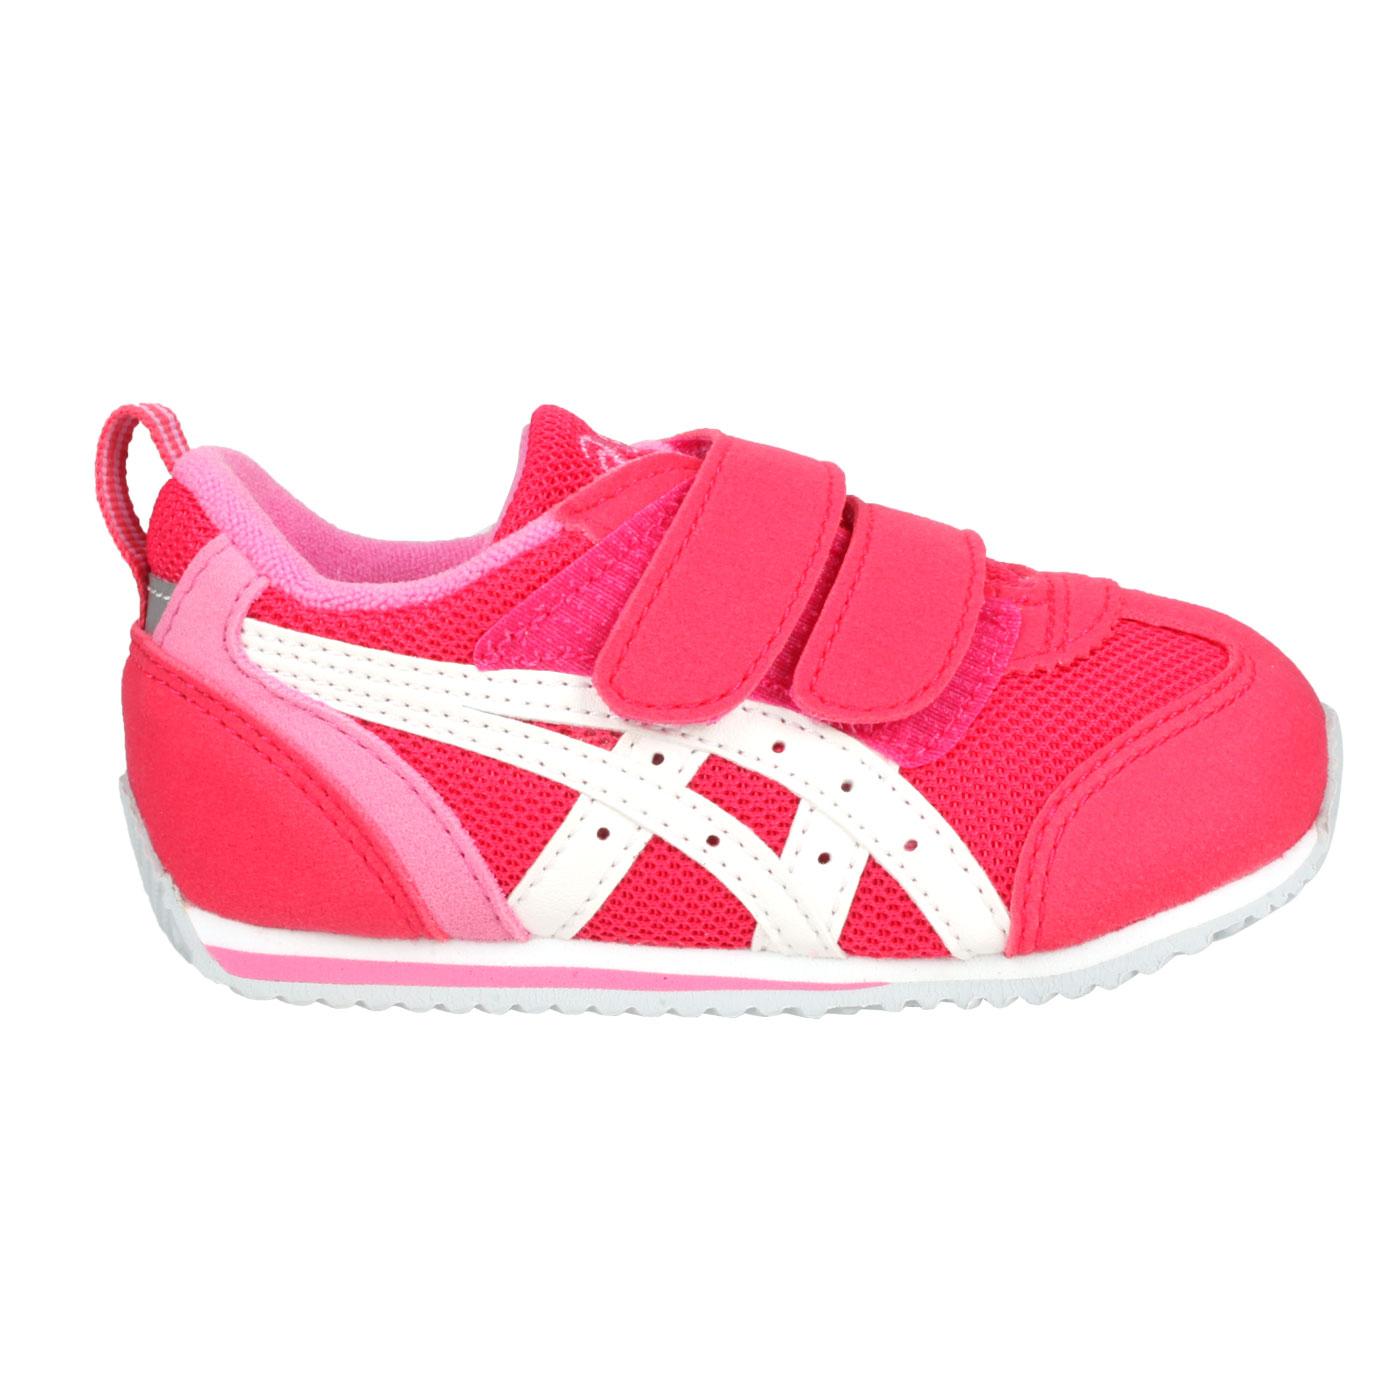 ASICS 小童運動鞋  @IDAHO BABY 3@TUB165-1901 - 玫紅白